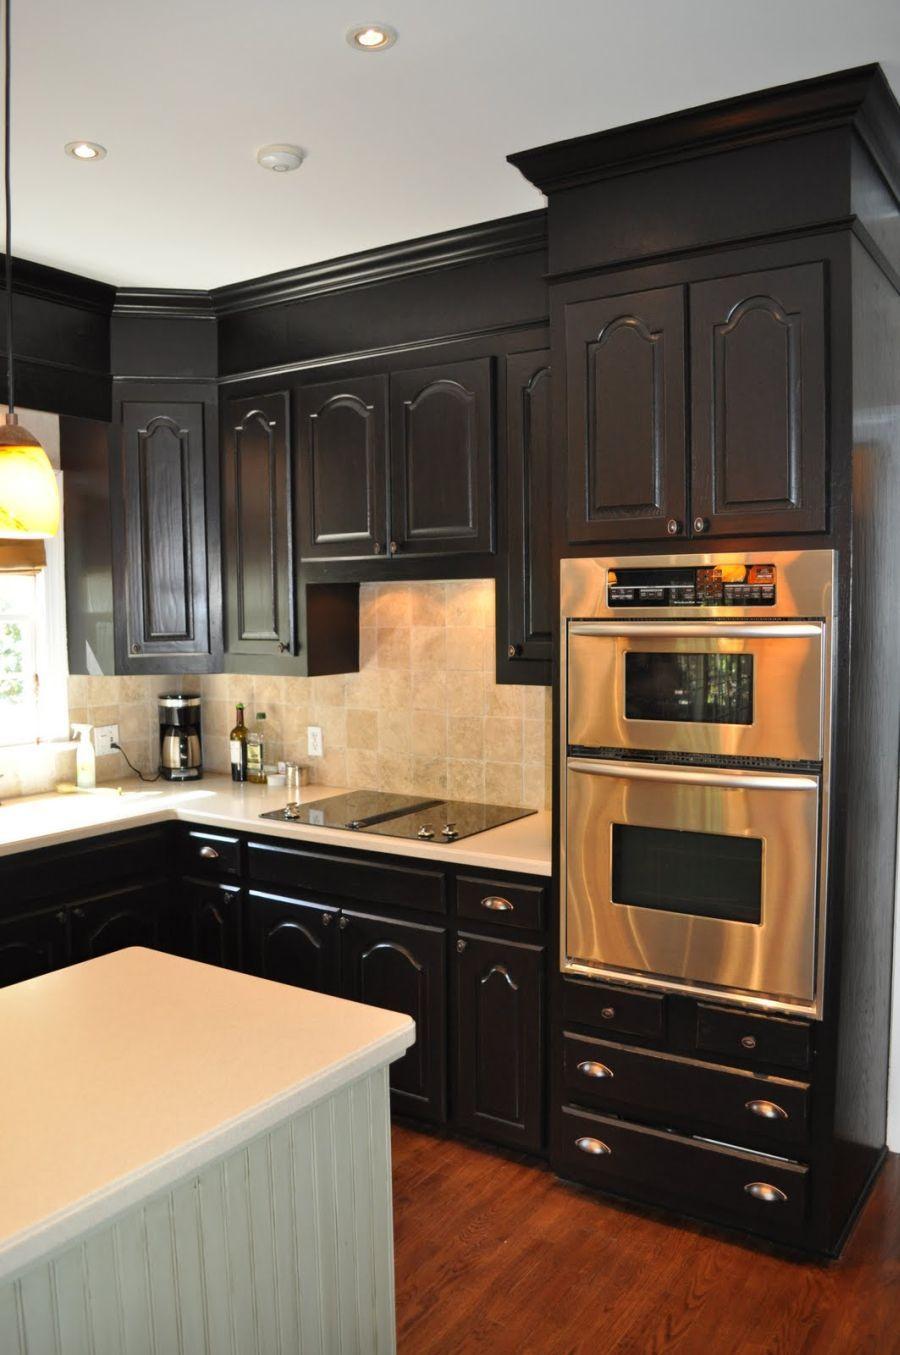 10 Unique Crown Molding Ideas For Kitchen one color fits most black kitchen cabinets dod1955msn 2021